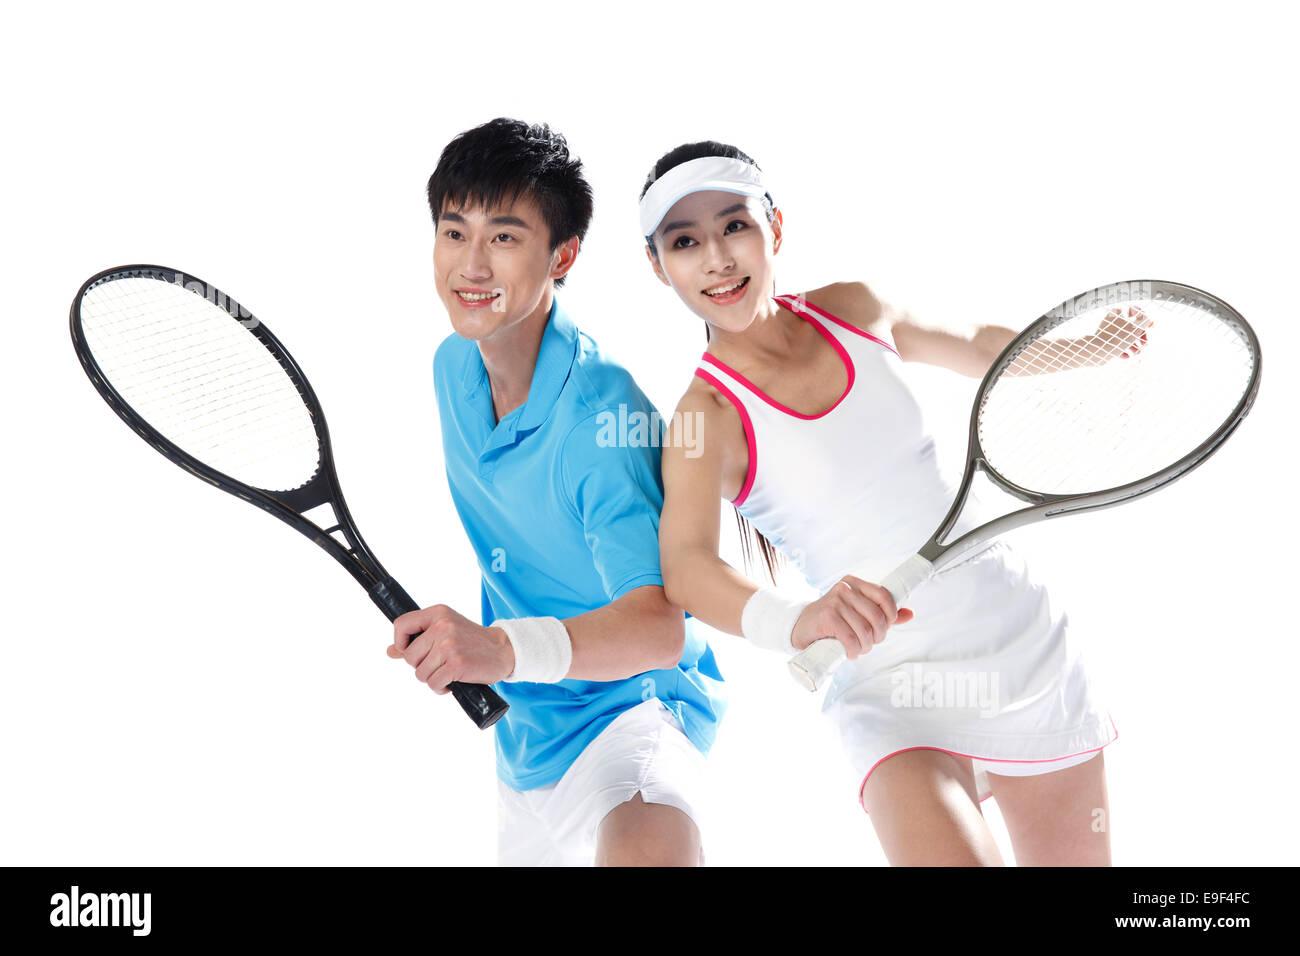 Tennis Players - Stock Image